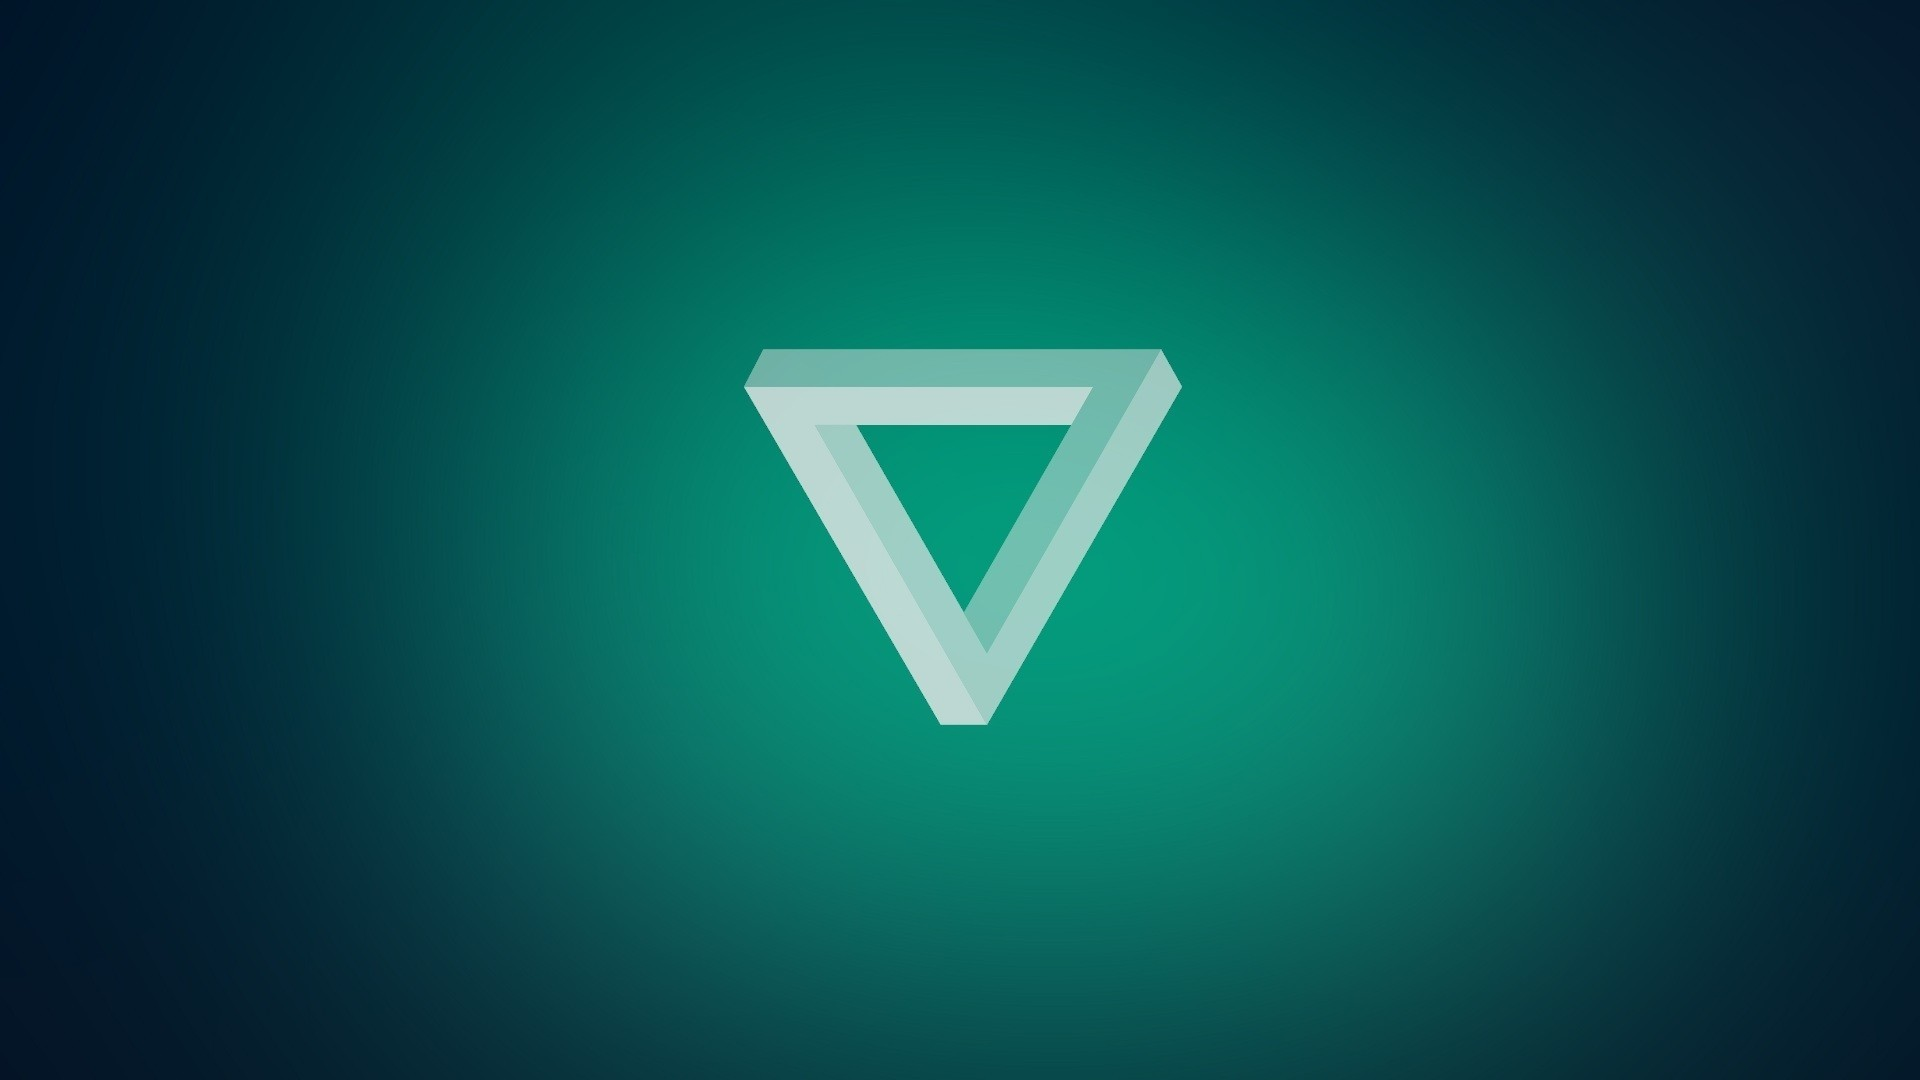 Wallpaper triangle, light, dark, shape